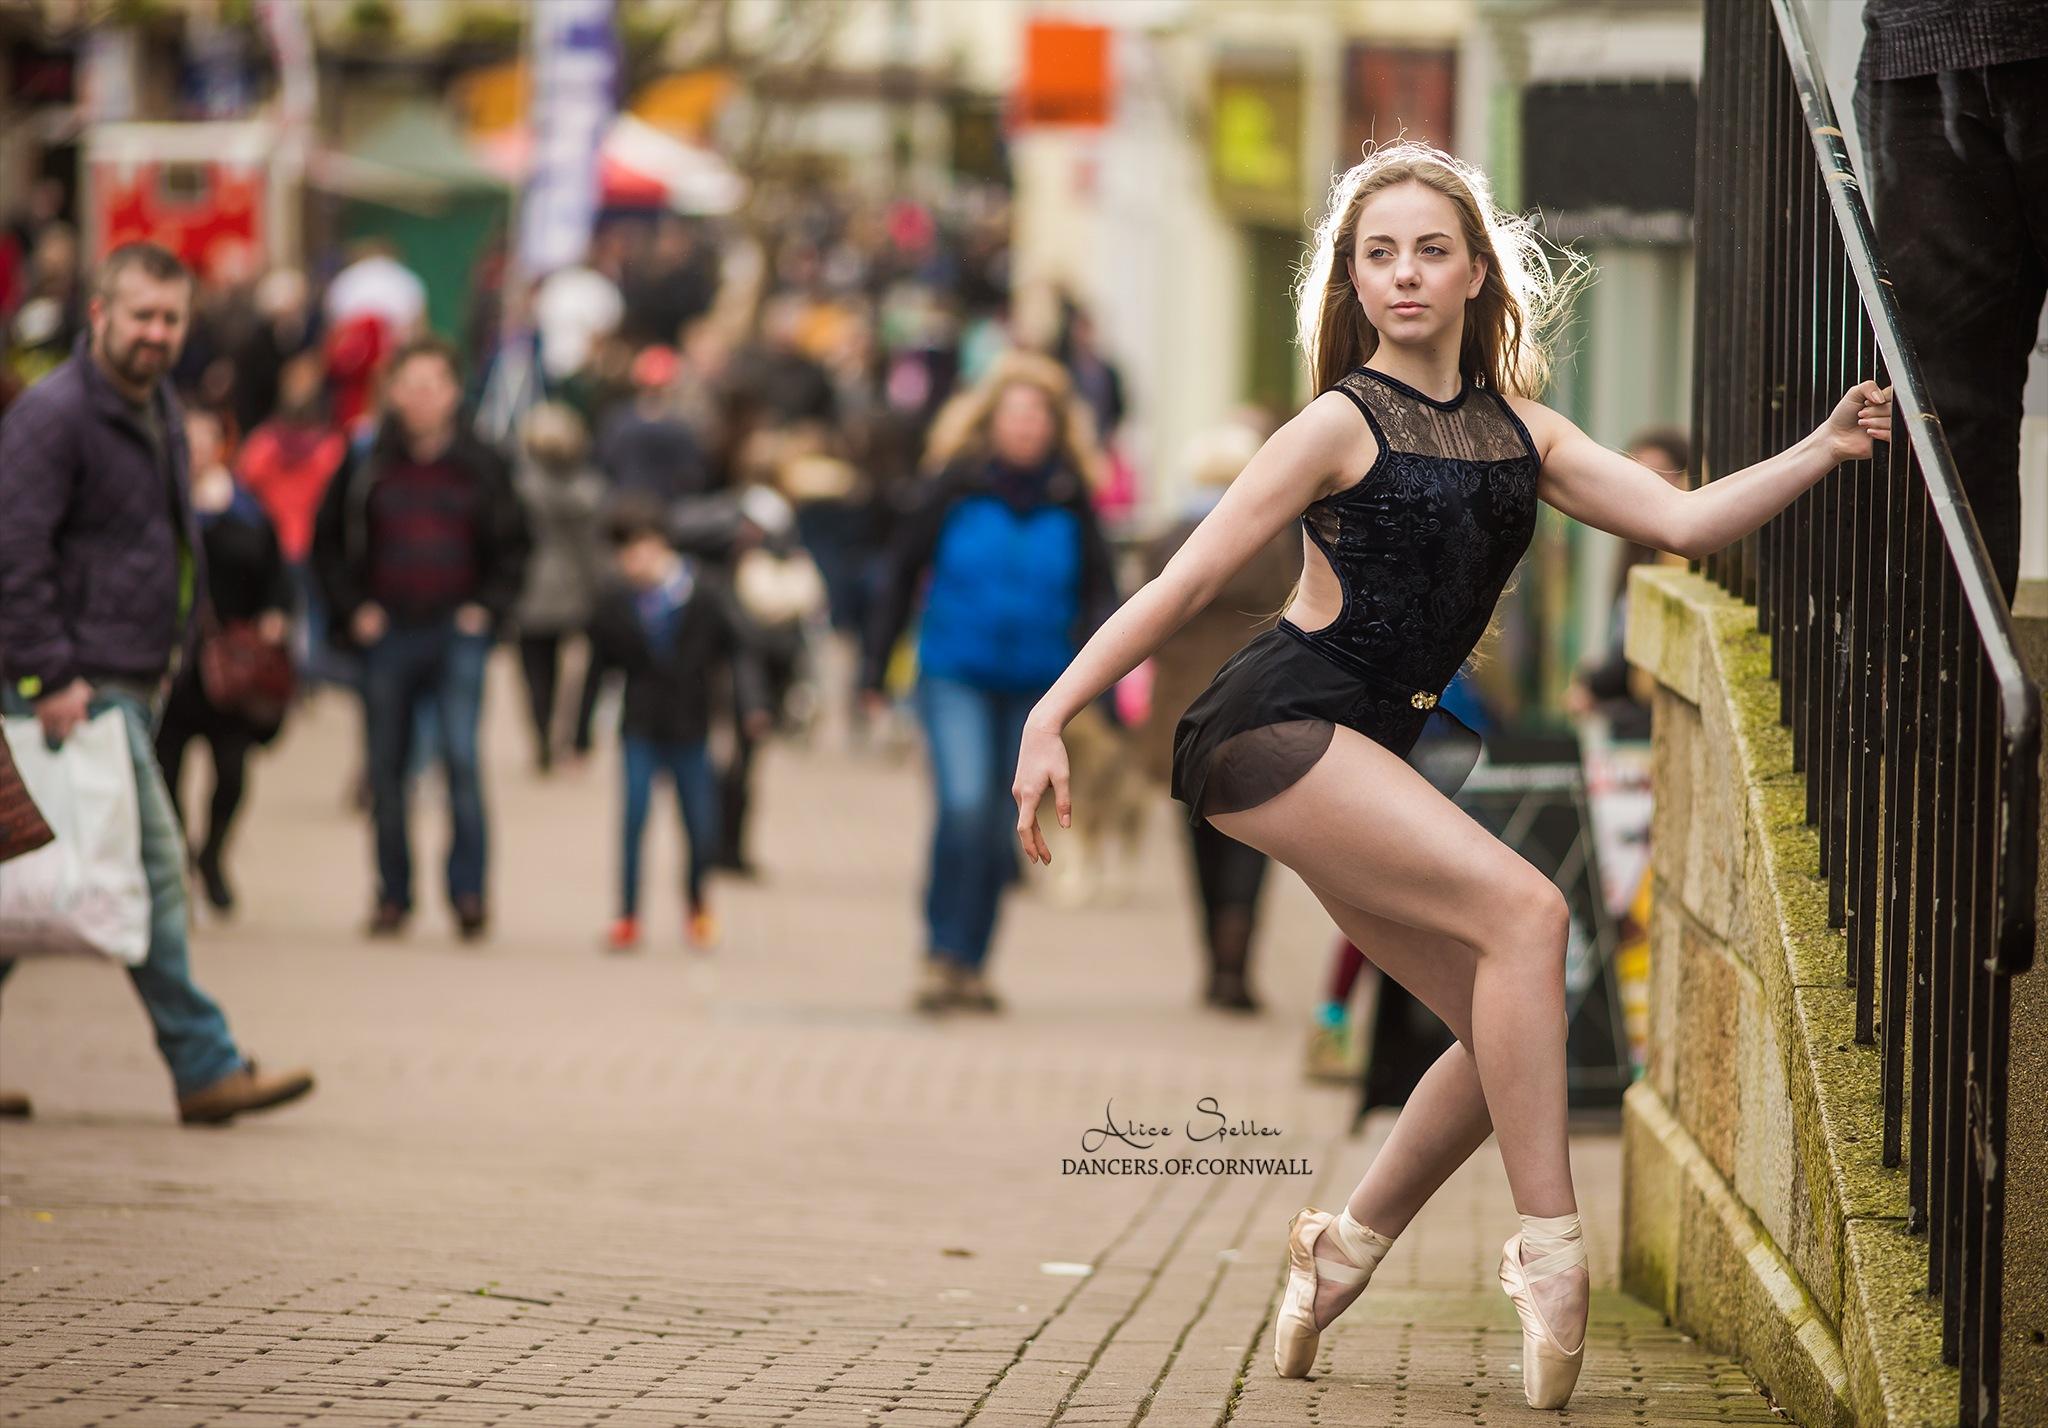 Dancers of Cornwall in Truro by Alice Speller